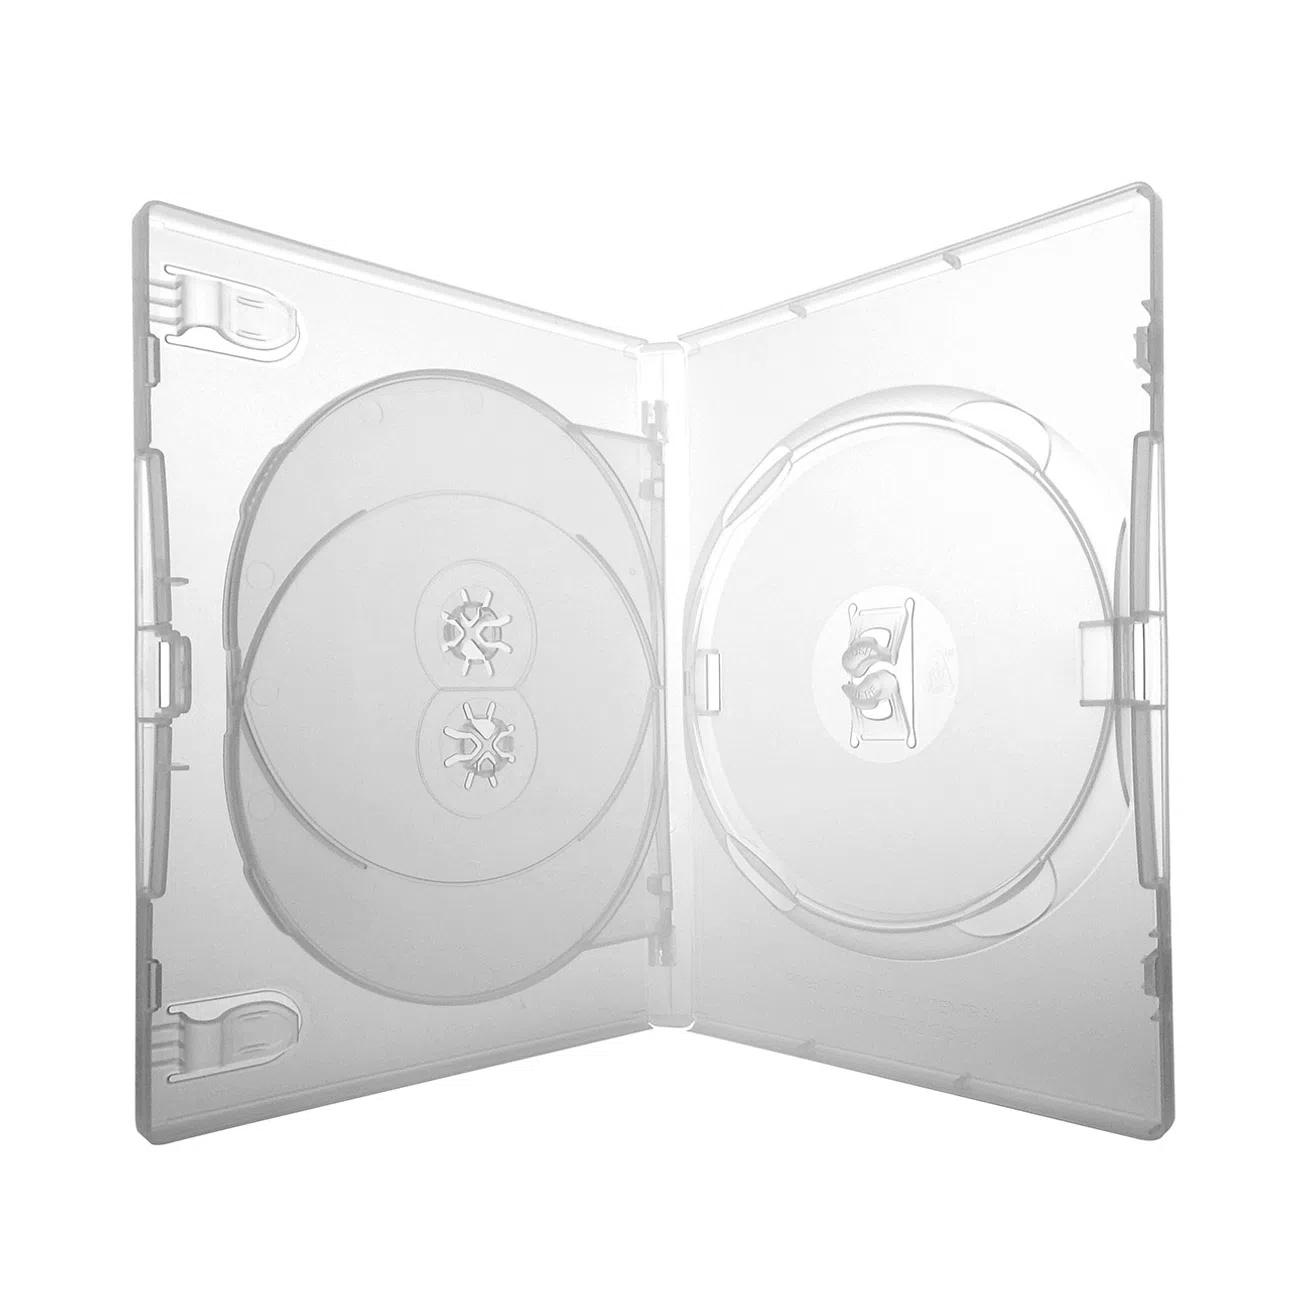 Estojo Caixa Box DVD Triplo 3 Transparente